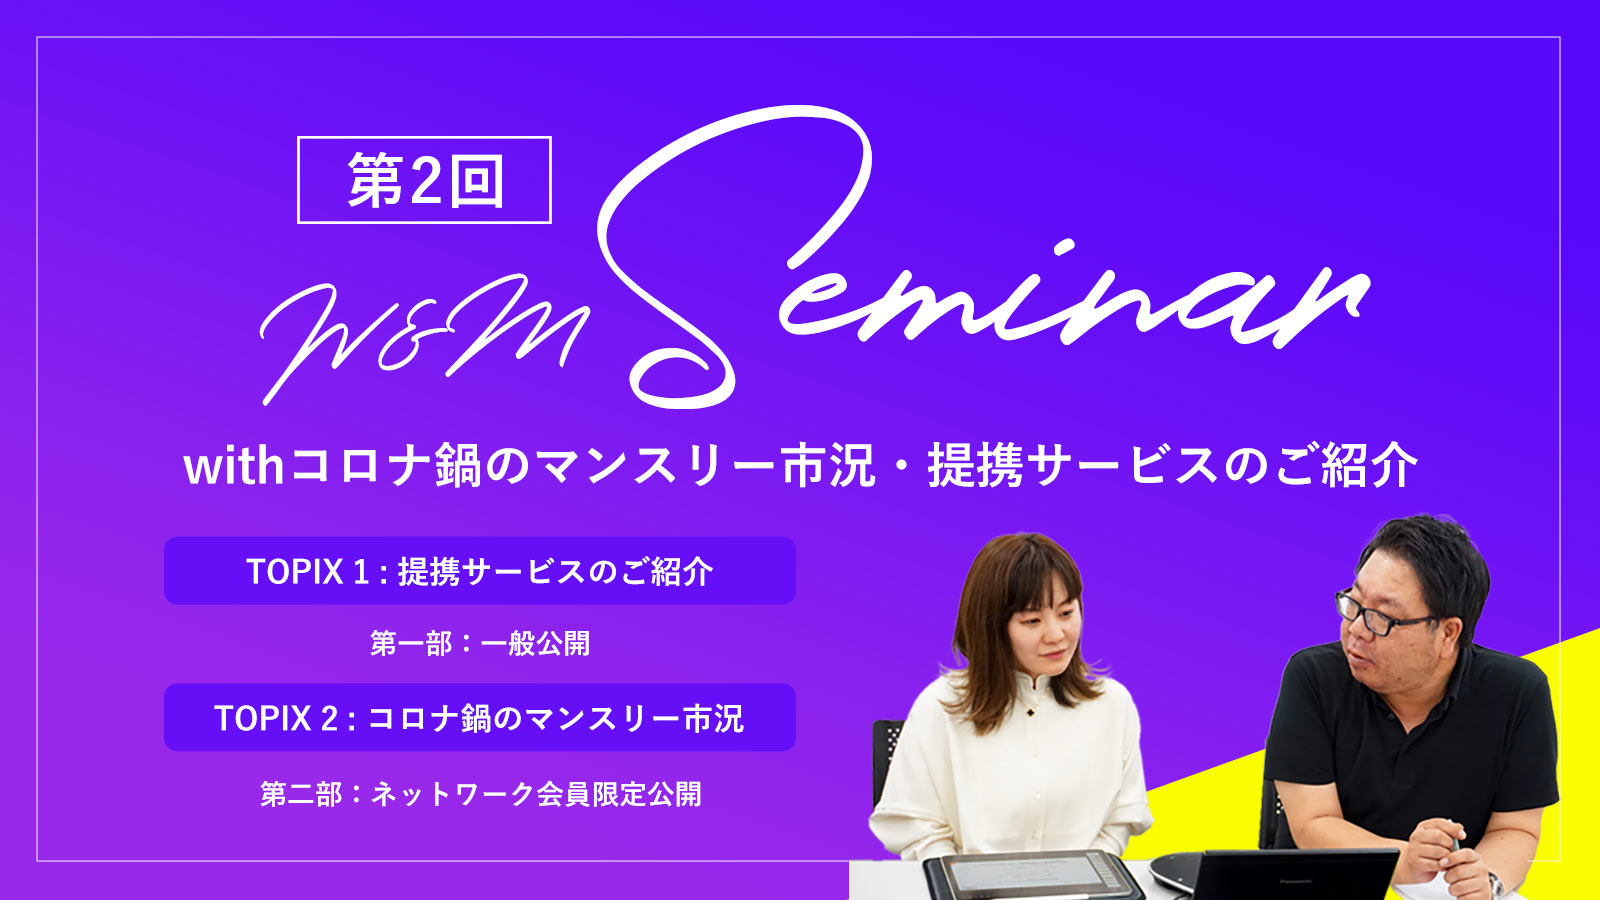 【PR】第2回W&Mセミナーを開催いたしました!